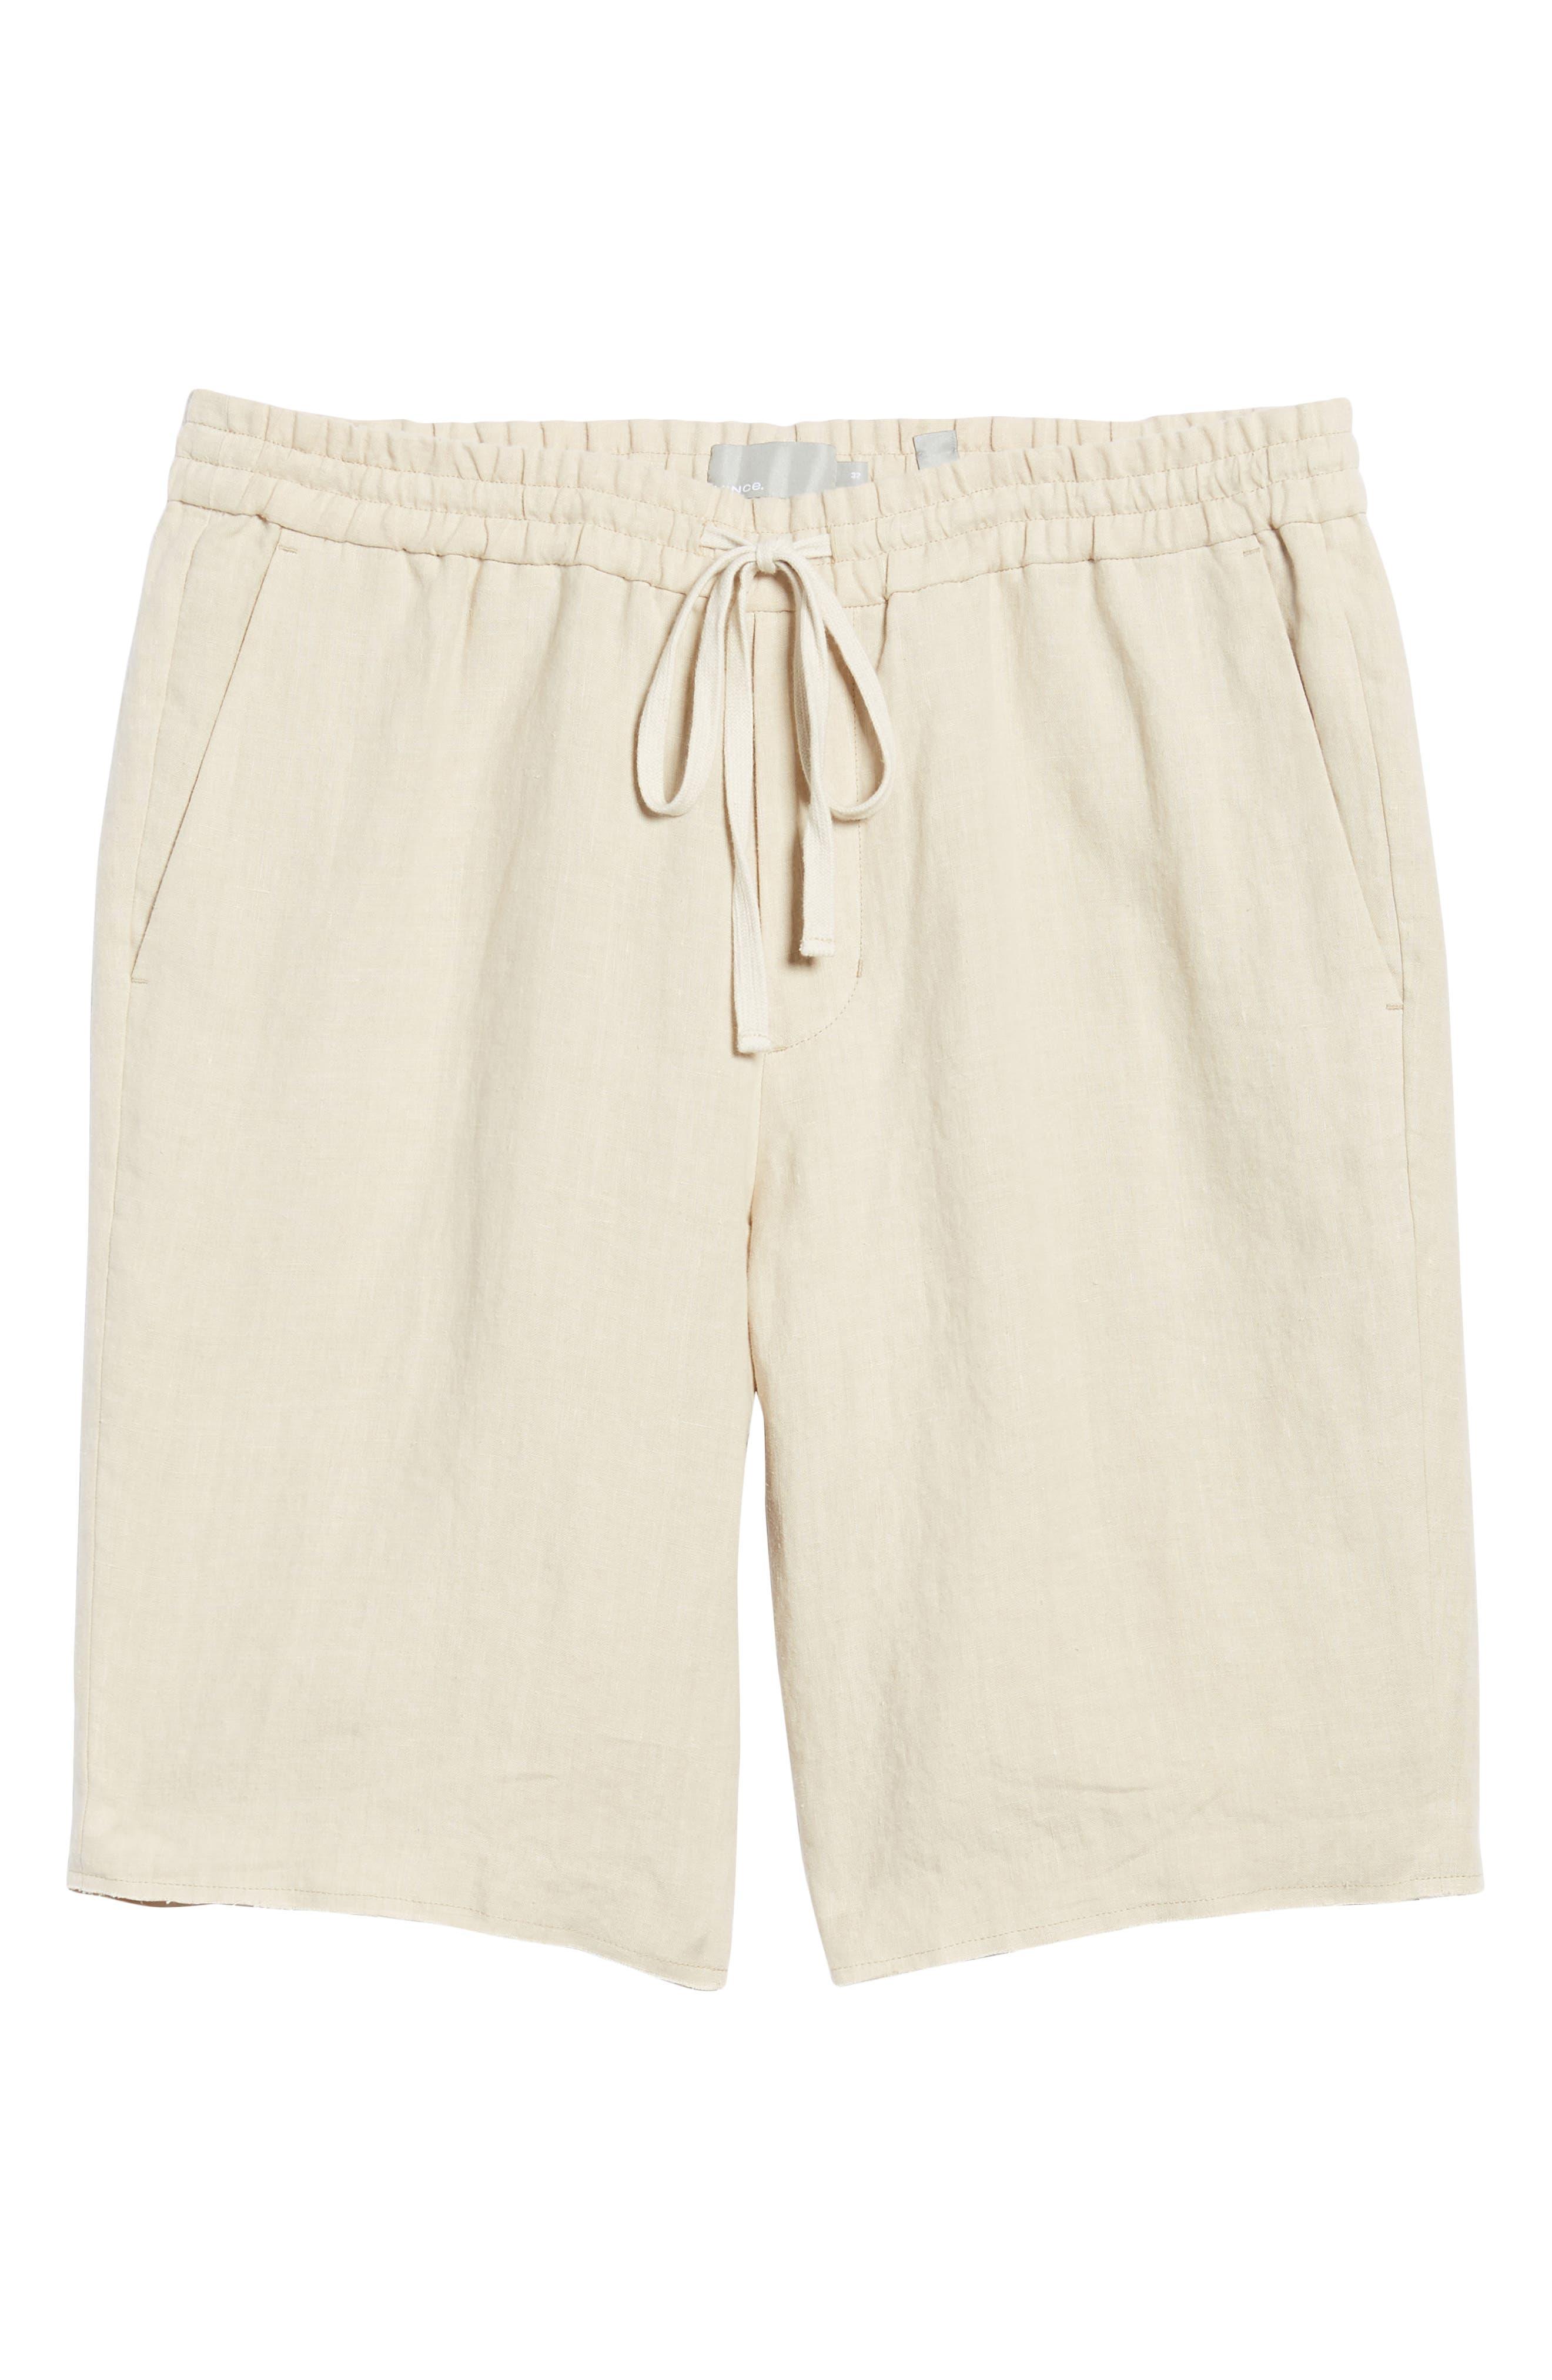 Raw Hem Slim Fit Track Shorts,                             Alternate thumbnail 6, color,                             100